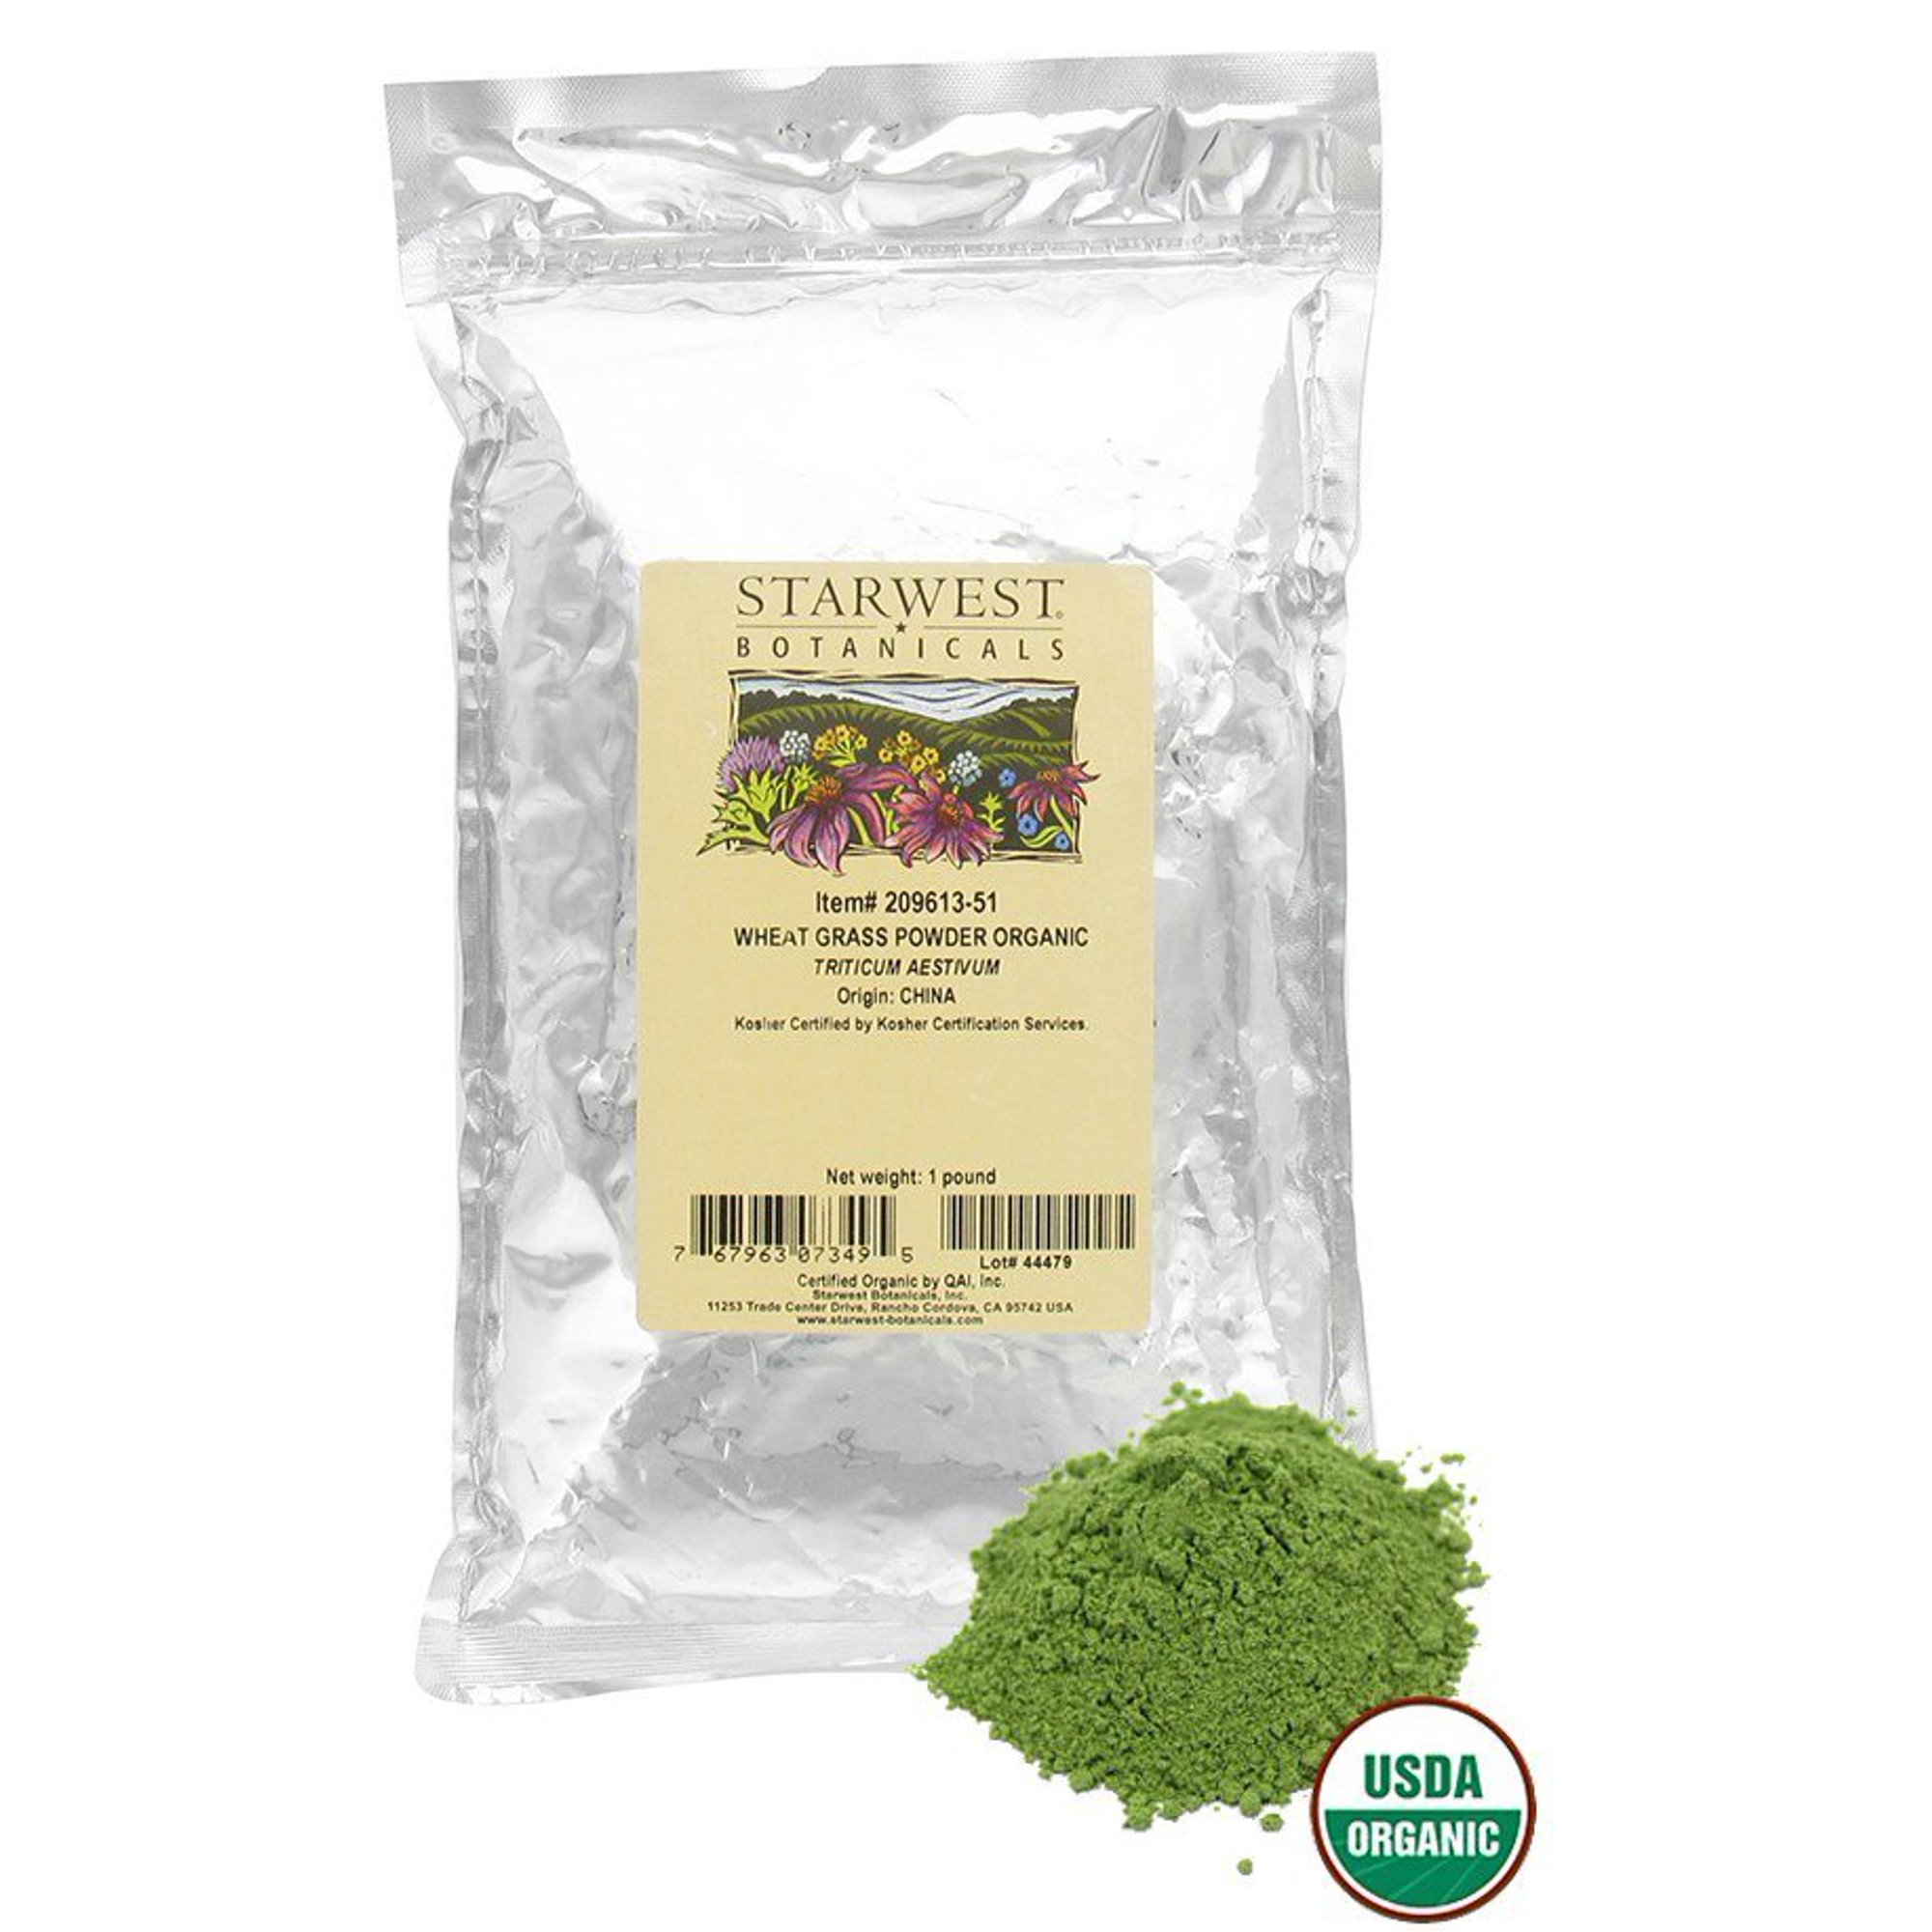 Buy Starwest Botanicals - Bulk Wheat Grass Powder Organic - 1 lb